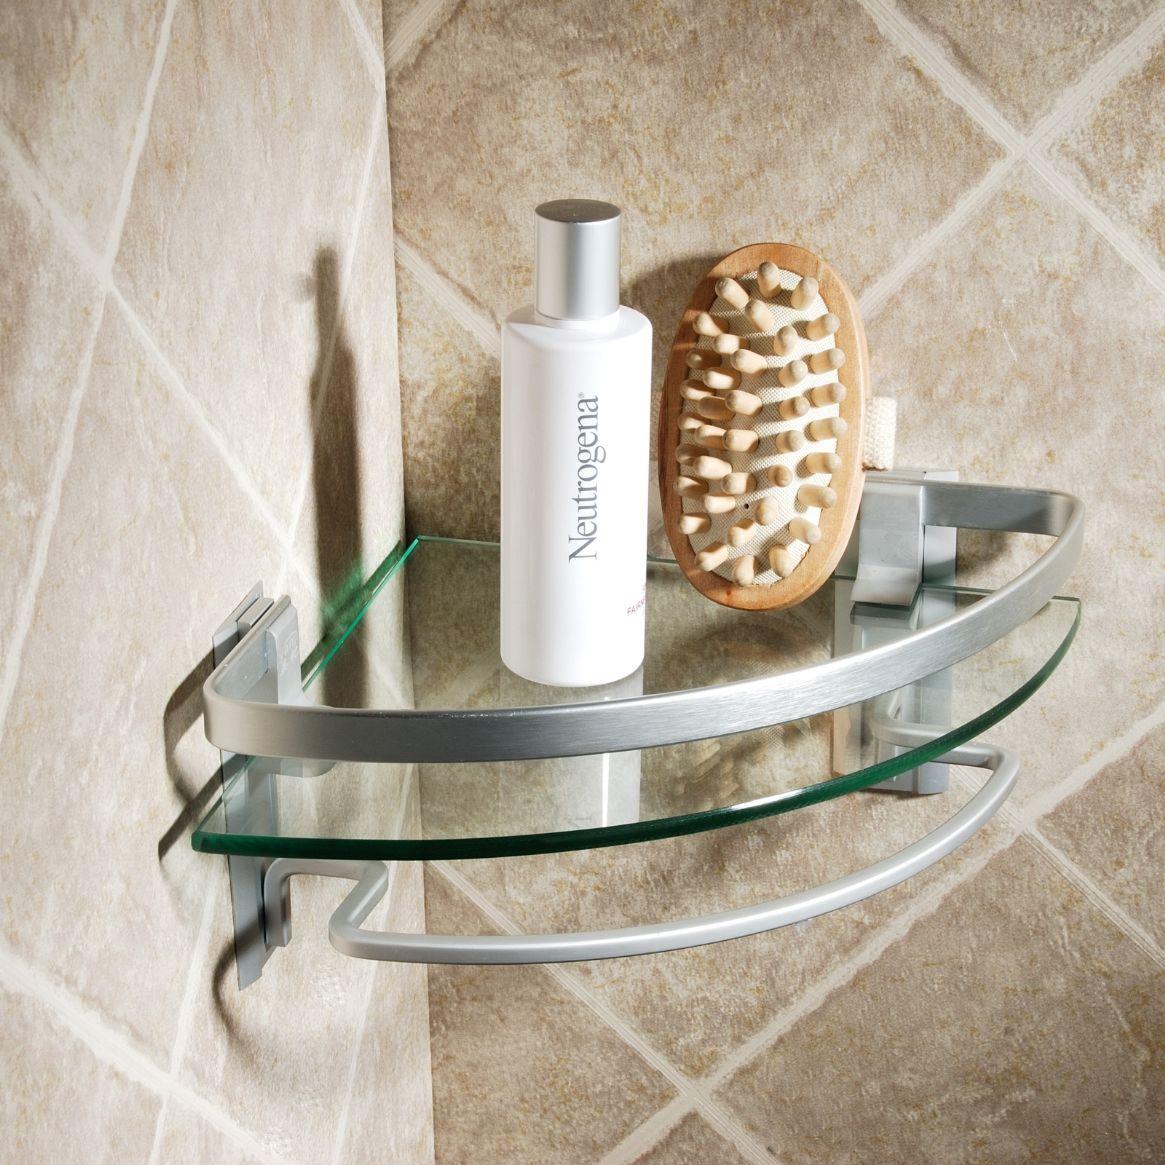 Awesome Brown Balcony Cabin Design For Bathroom Storage Ideas - Small corner shelf for bathroom for bathroom decor ideas